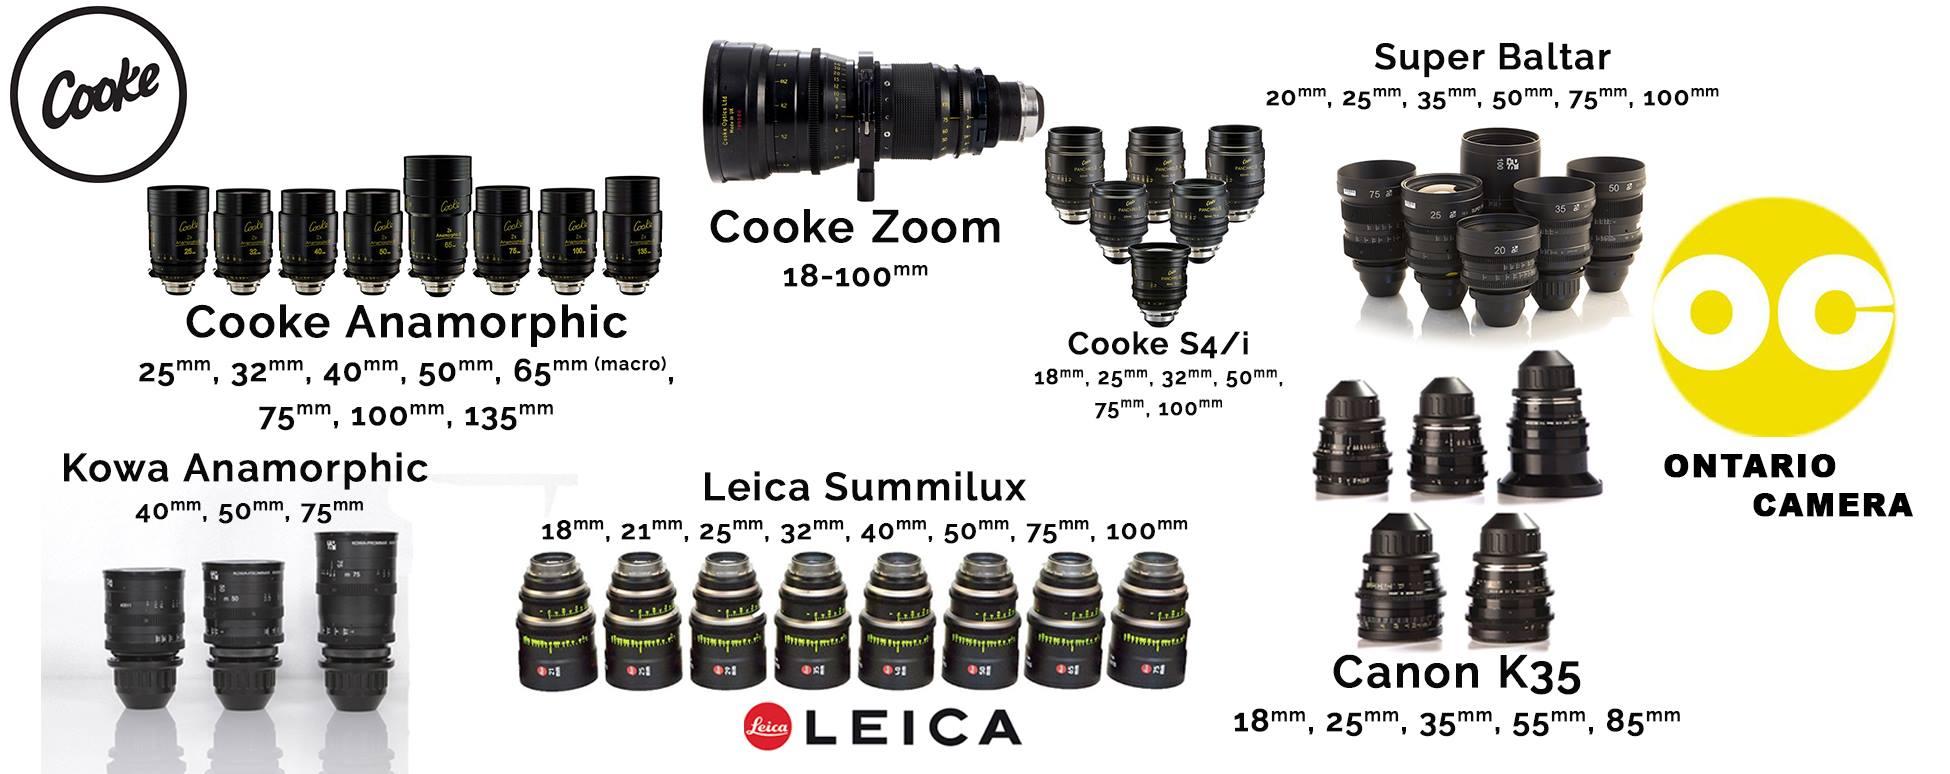 cinema lens rentals toronto